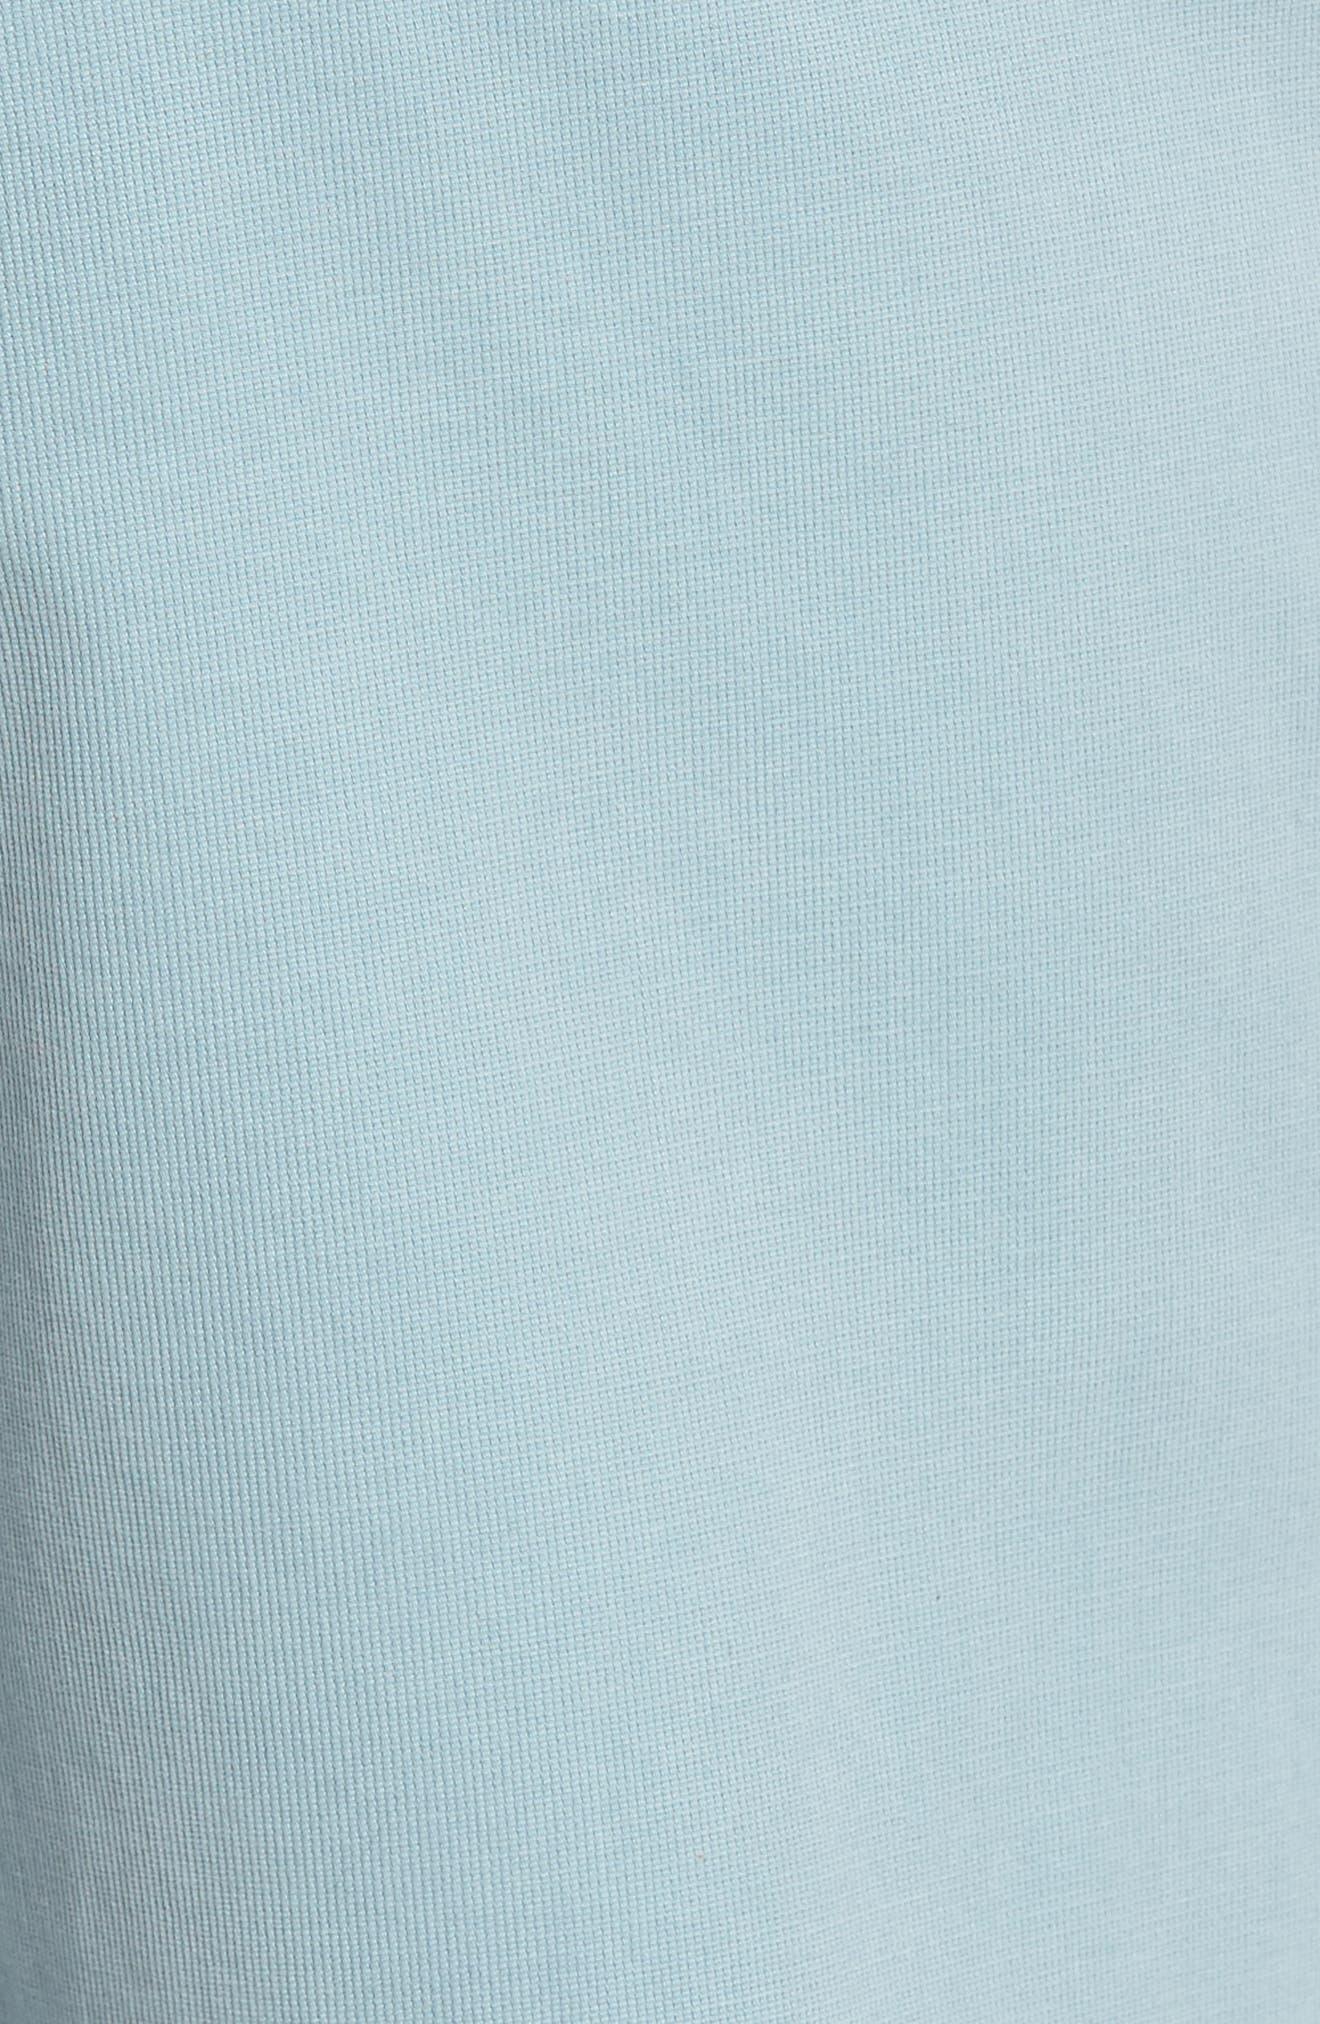 Alternate Image 5  - Tommy Bahama 'Bedford & Sons' Shorts